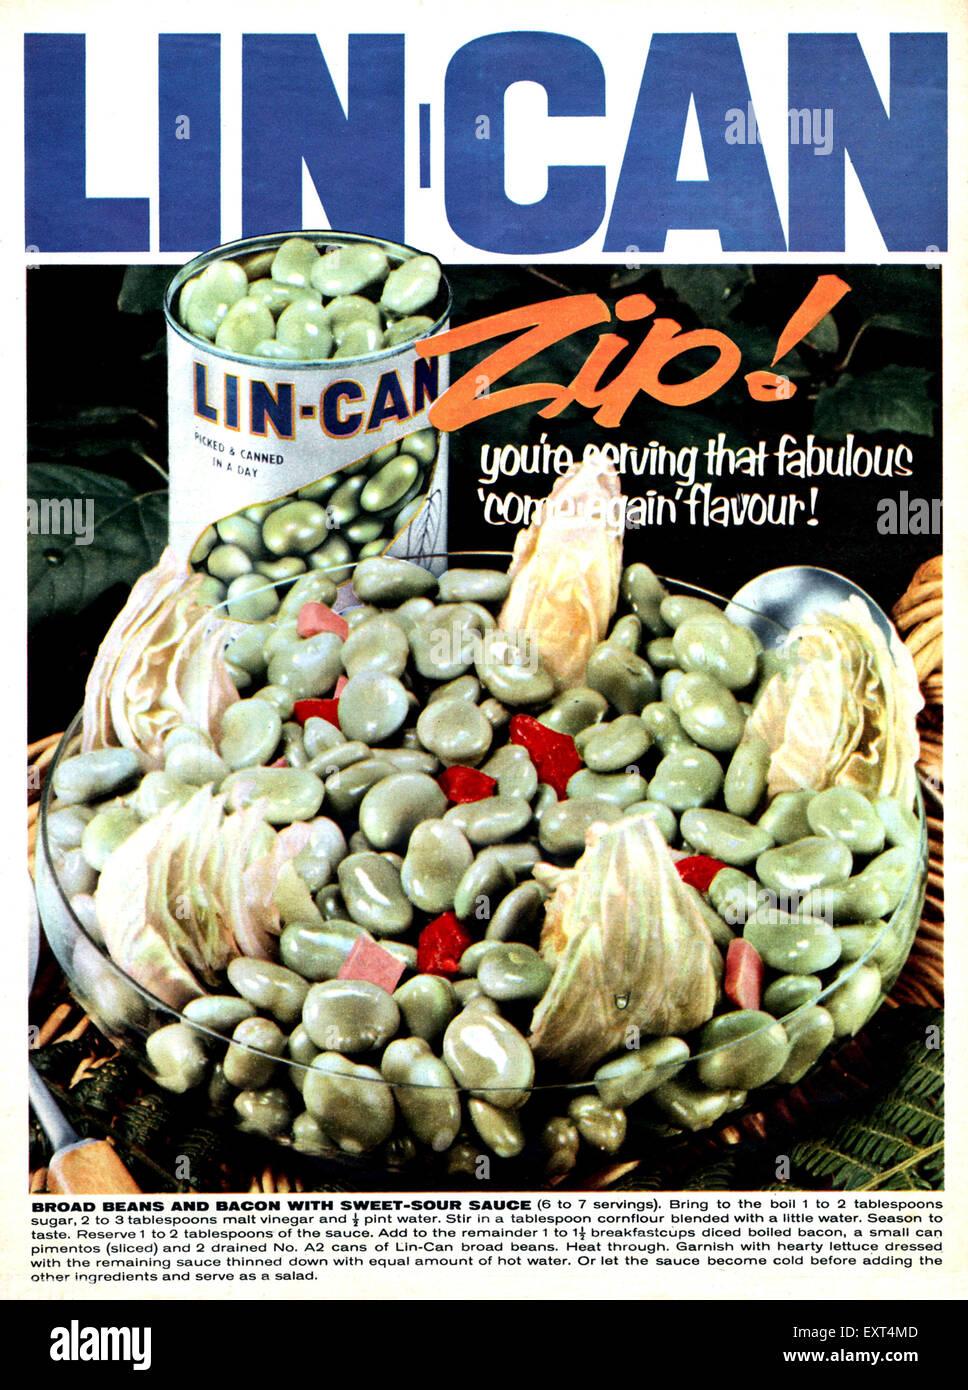 1960s UK Lin-Can Magazine Advert - Stock Image